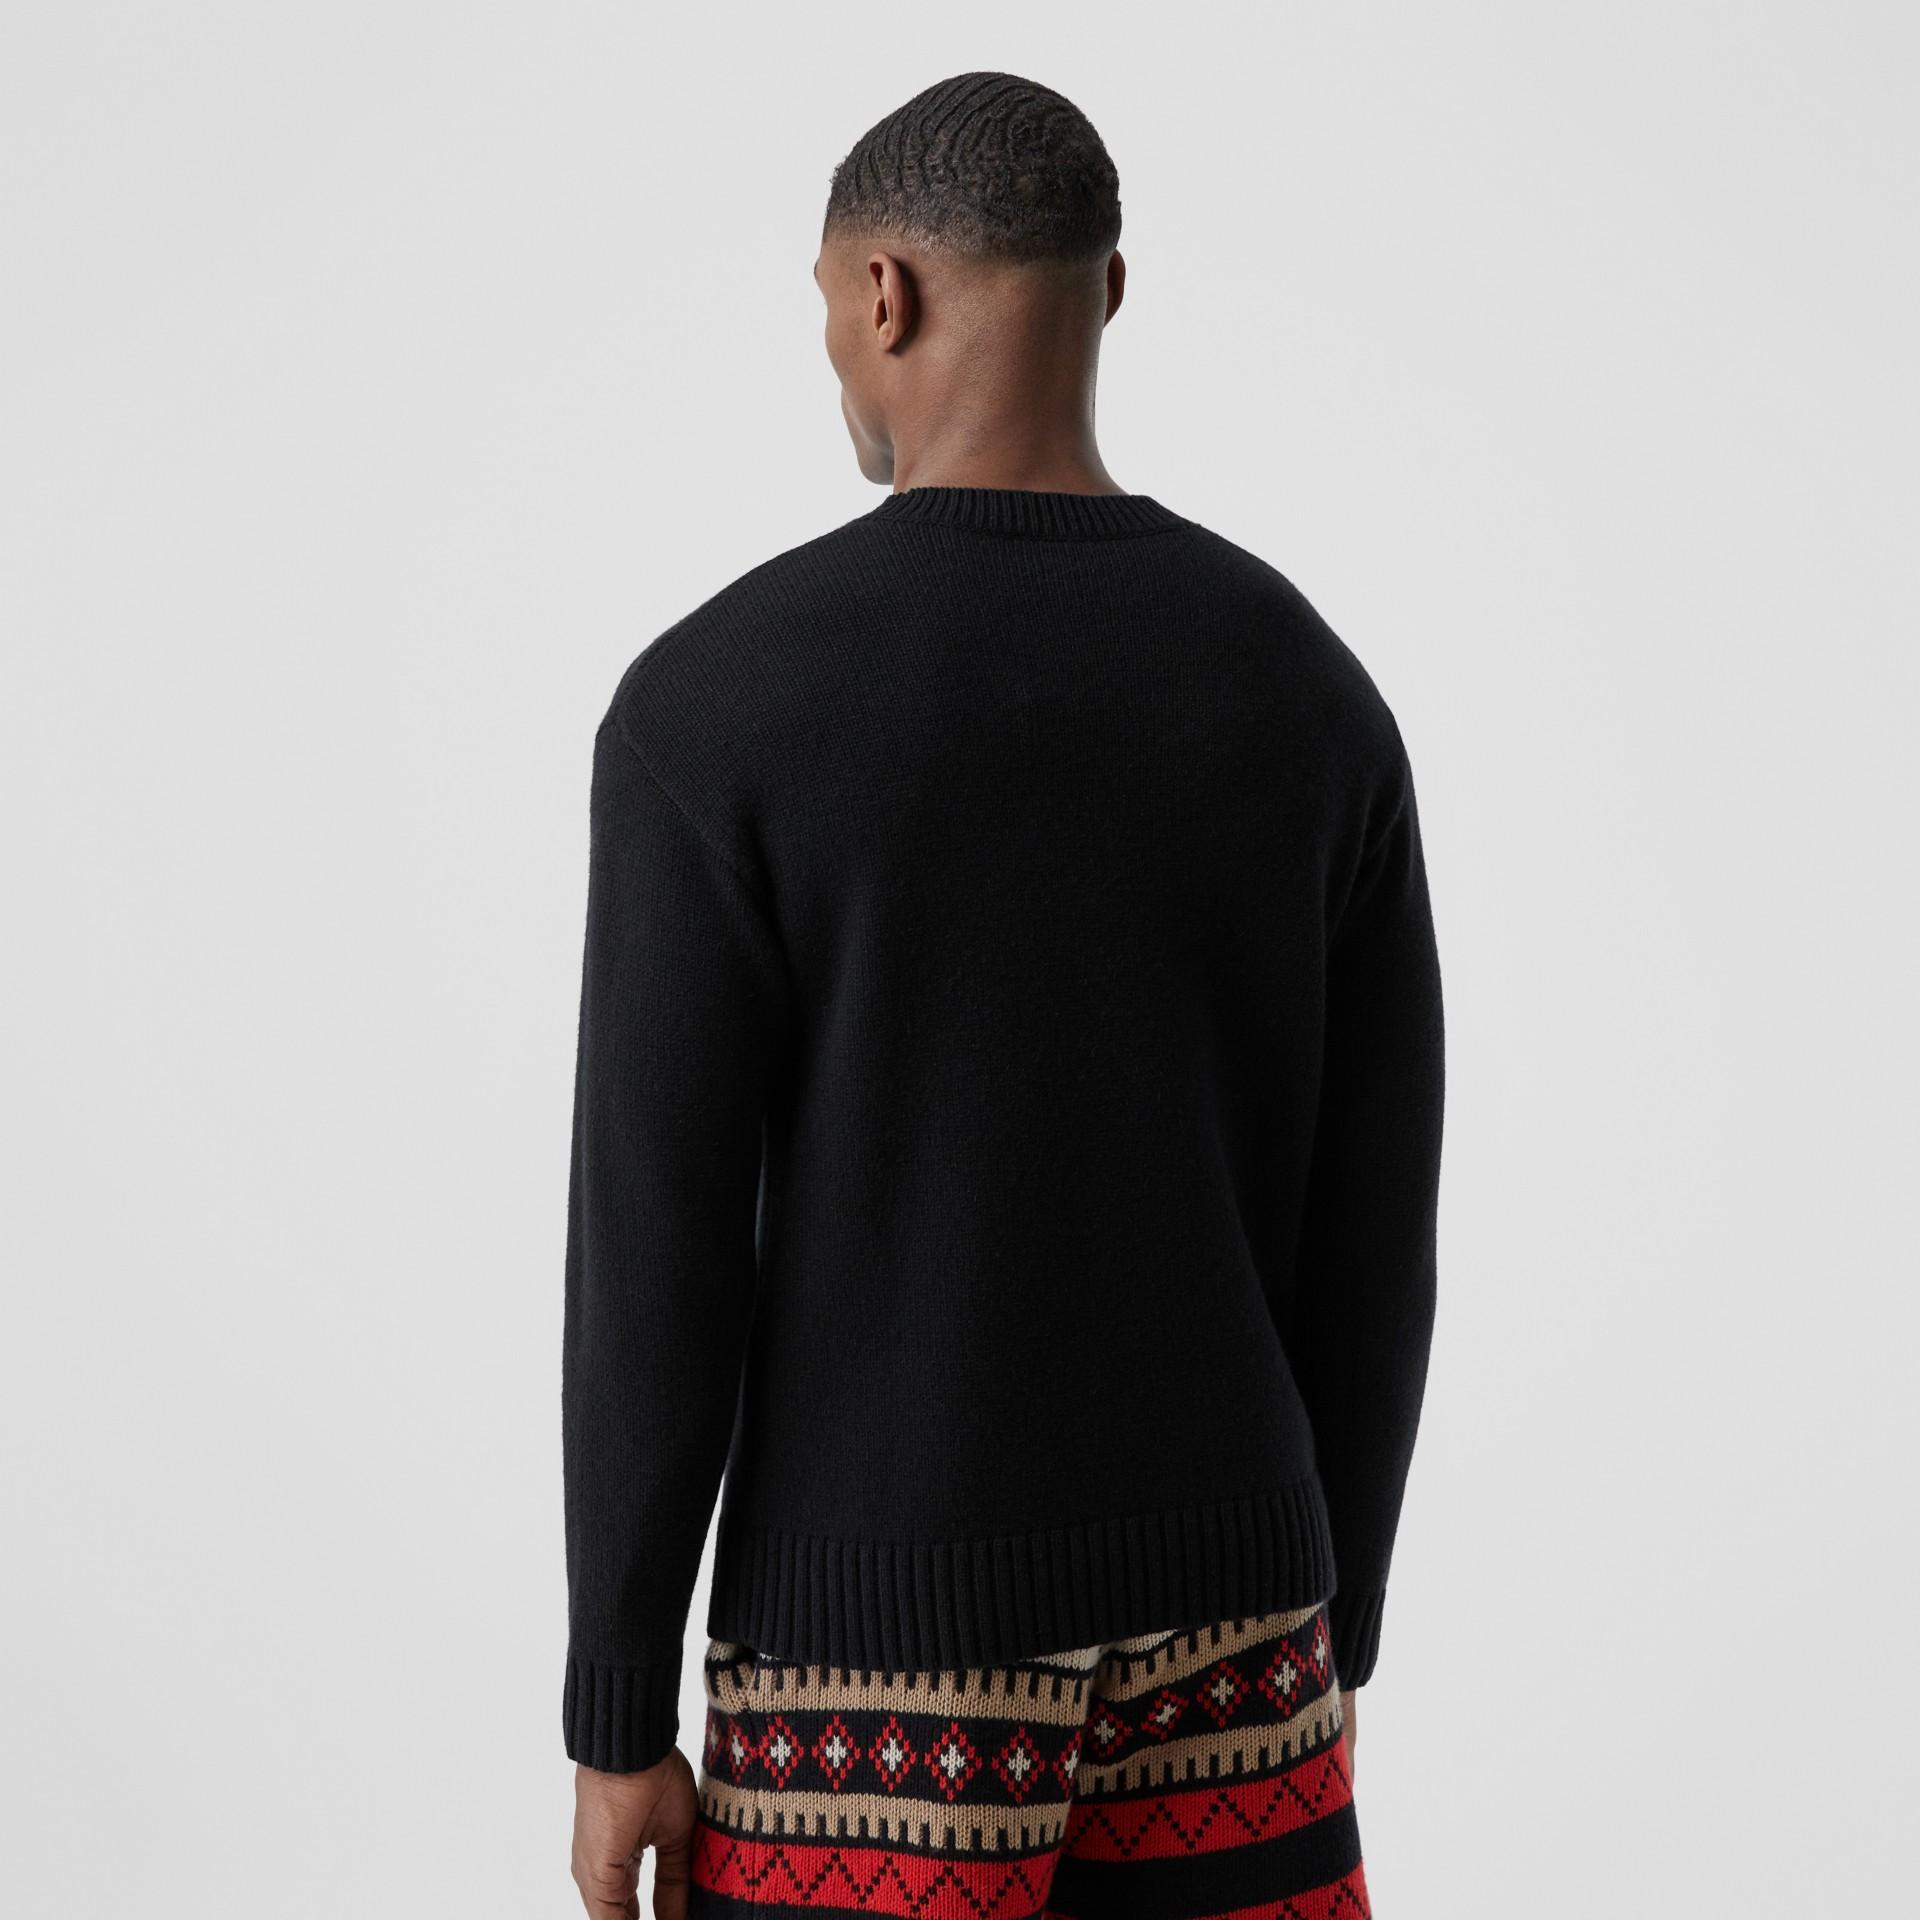 Slogan Intarsia Cashmere Sweater in Black - Men | Burberry - gallery image 2